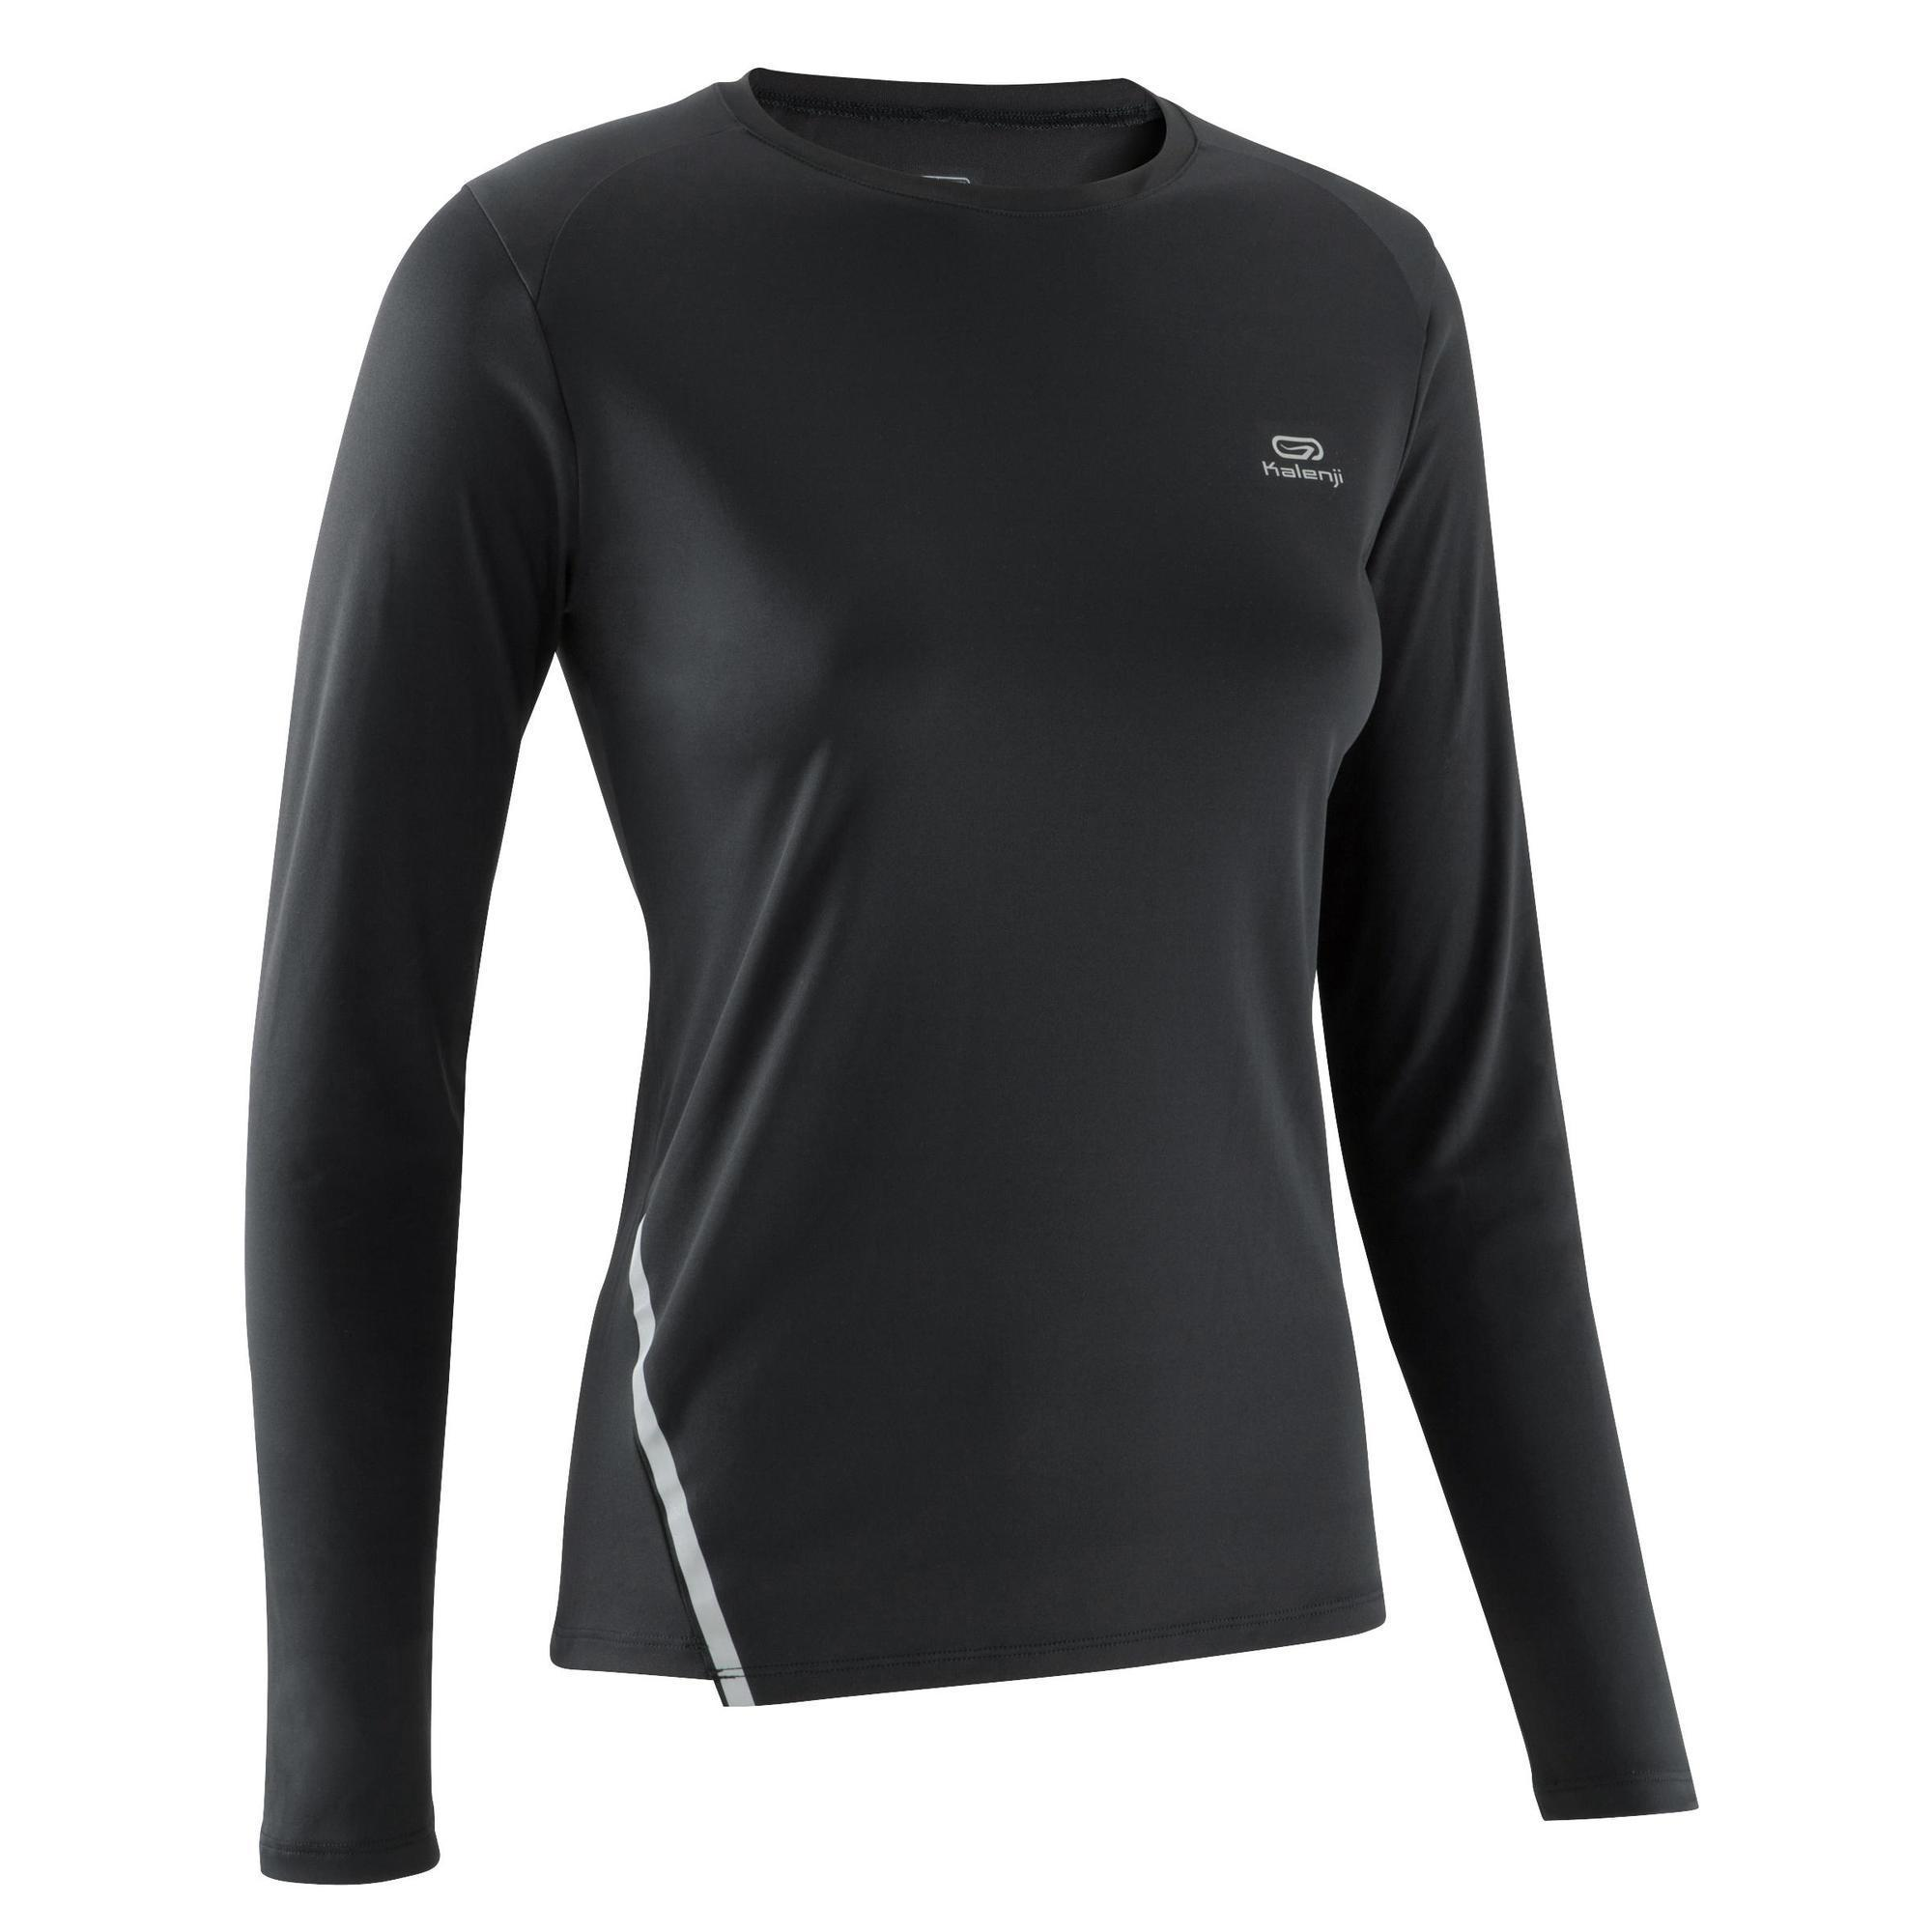 Laufshirt langarm Run Sun Protect Damen schwarz   Sportbekleidung > Sportshirts > Laufshirts   Schwarz   Ab   Kalenji